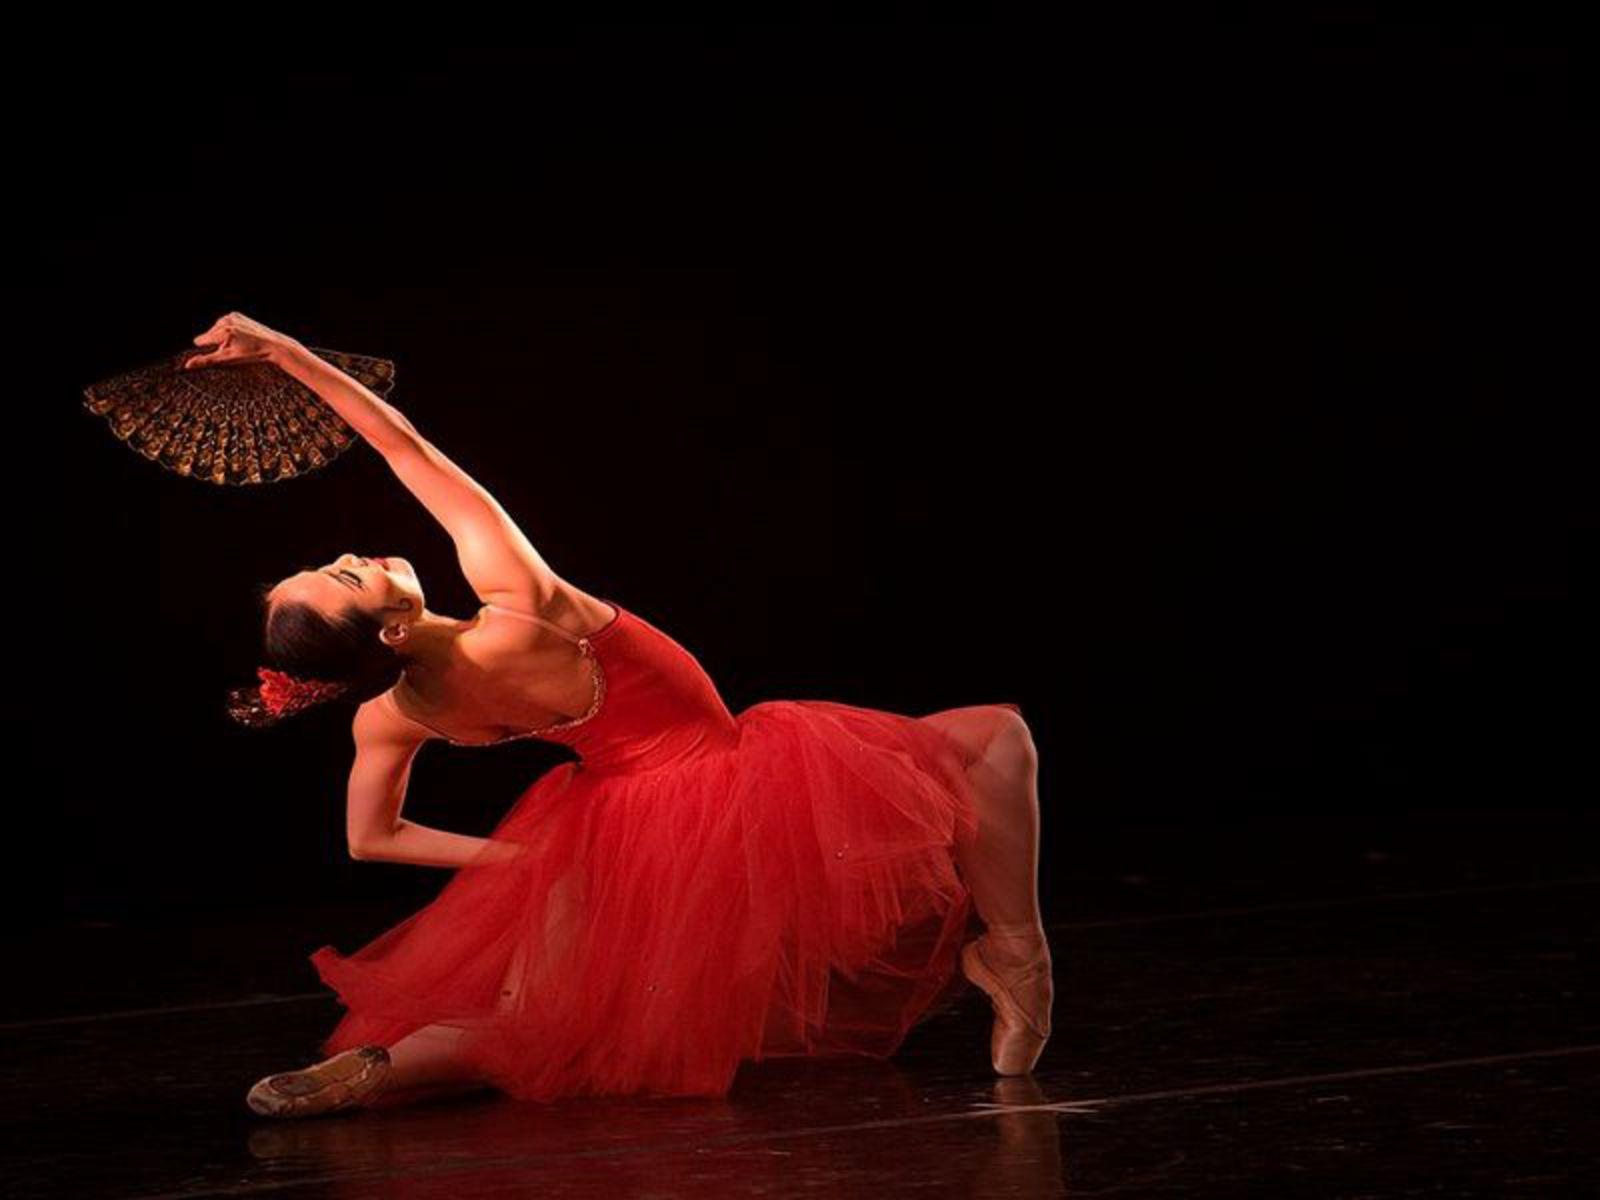 Wallpaper Ballerina hd wallon 1600x1200